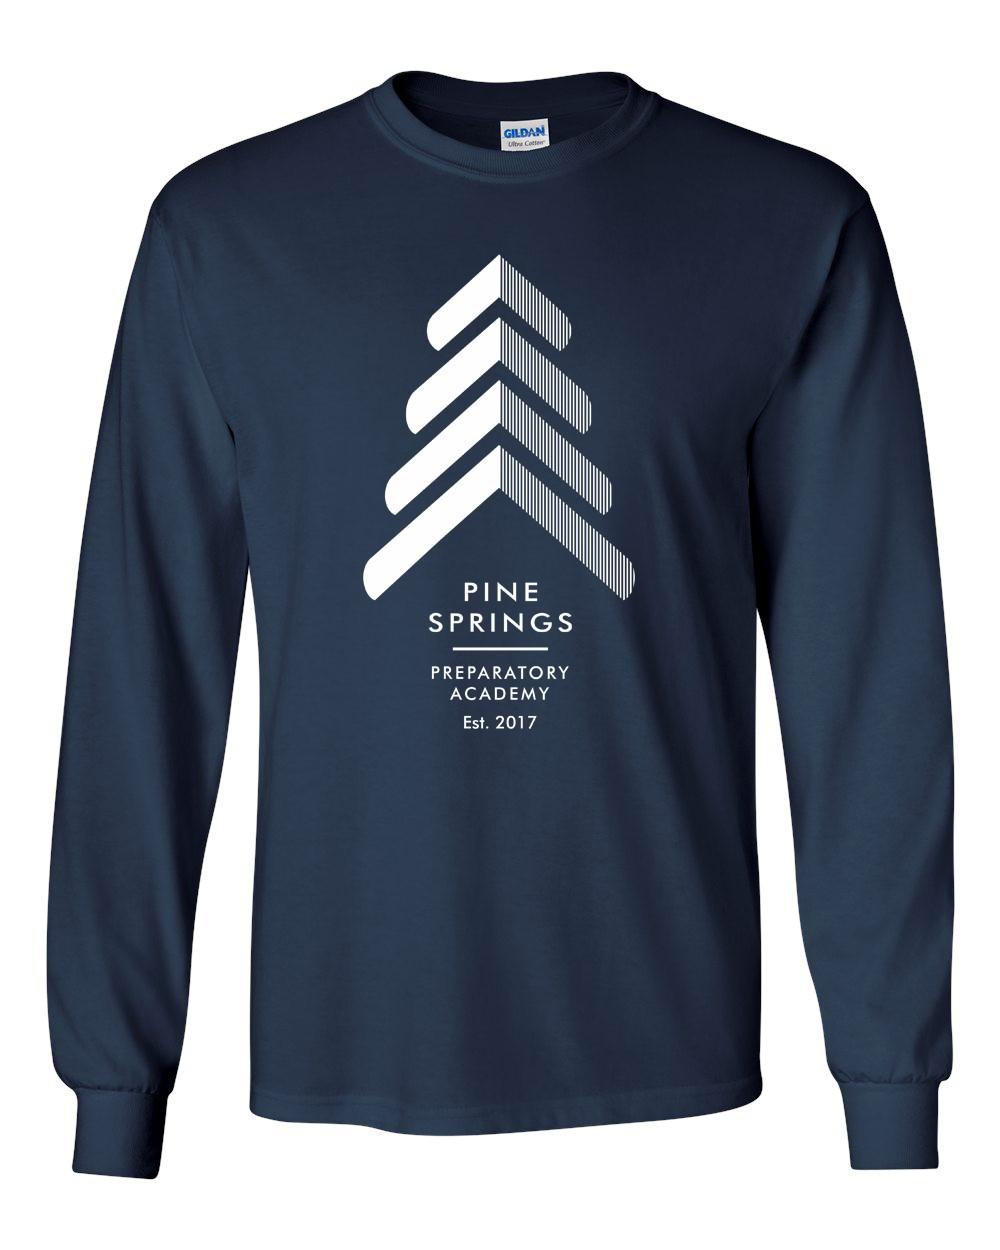 Pine Springs 100% Cotton Pre-Shrunk Long Sleeve Tees